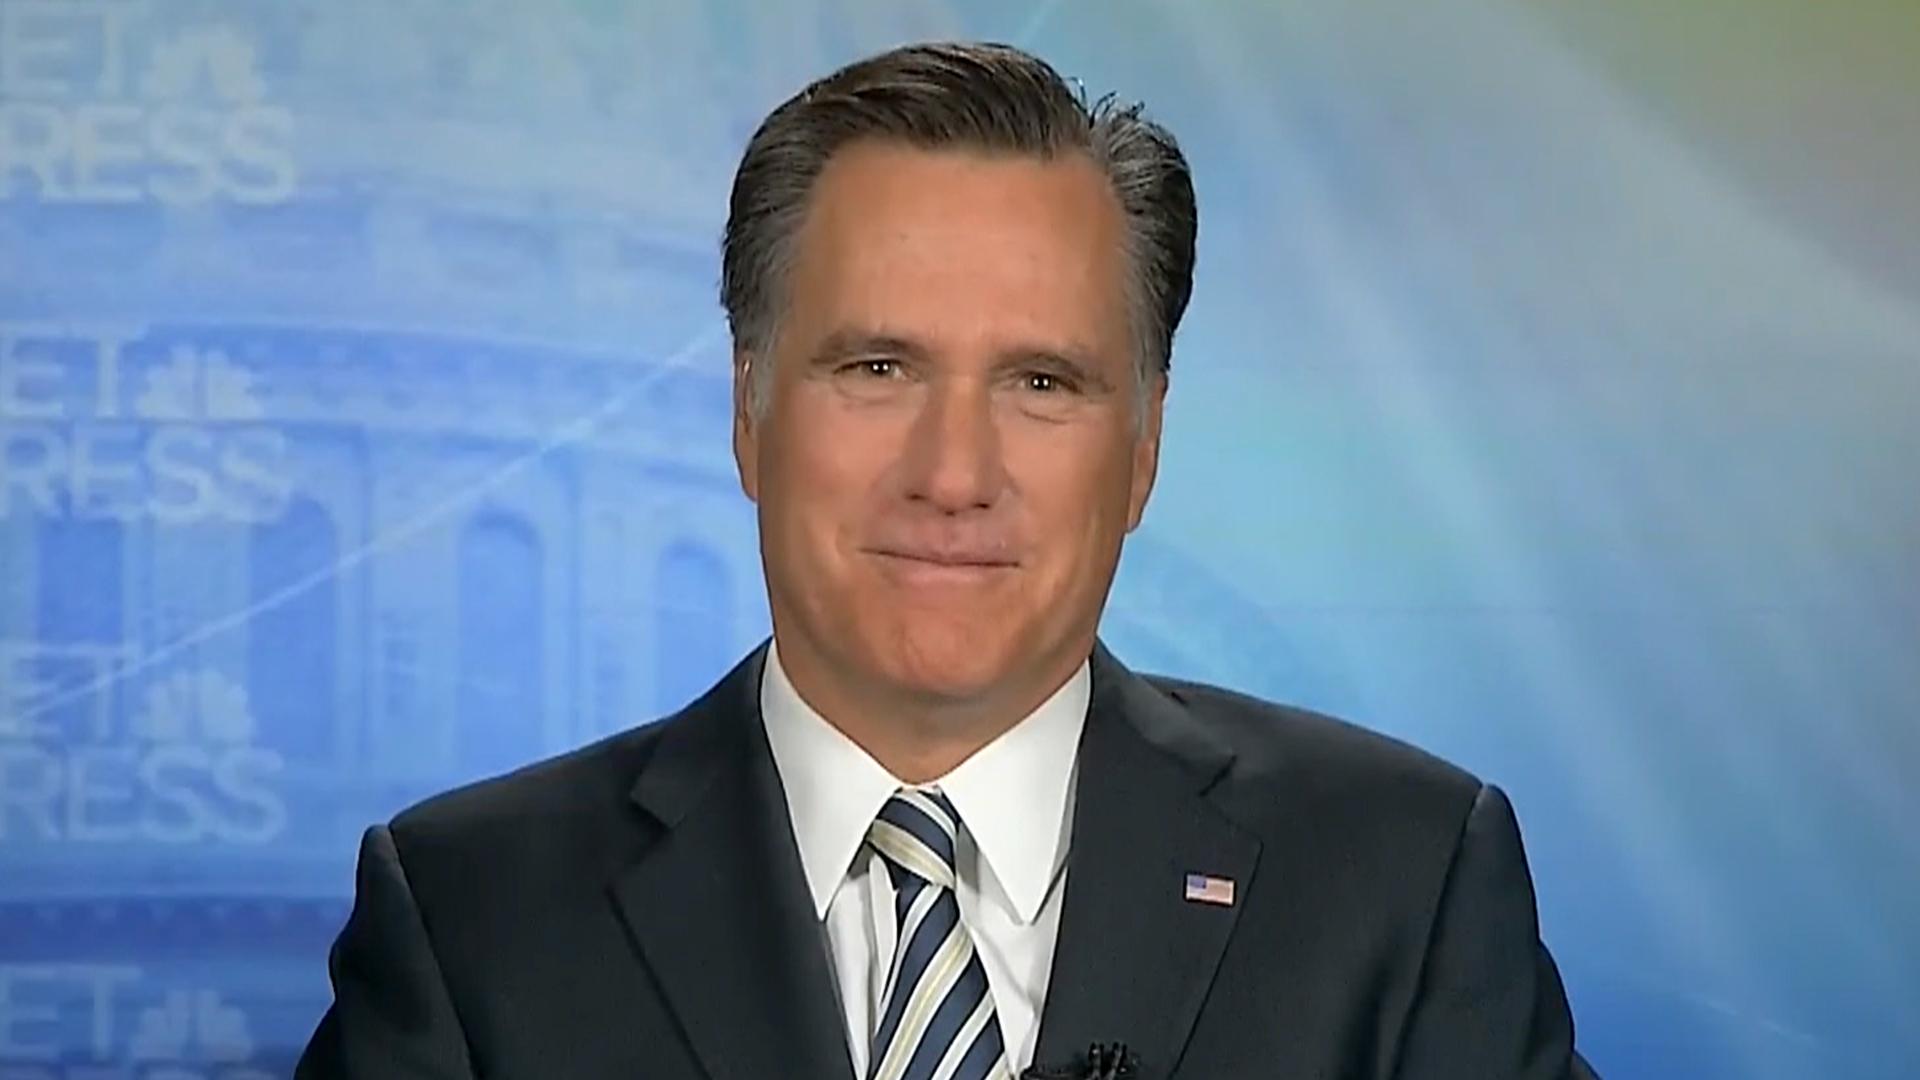 romney meet the press 2016 ncaa